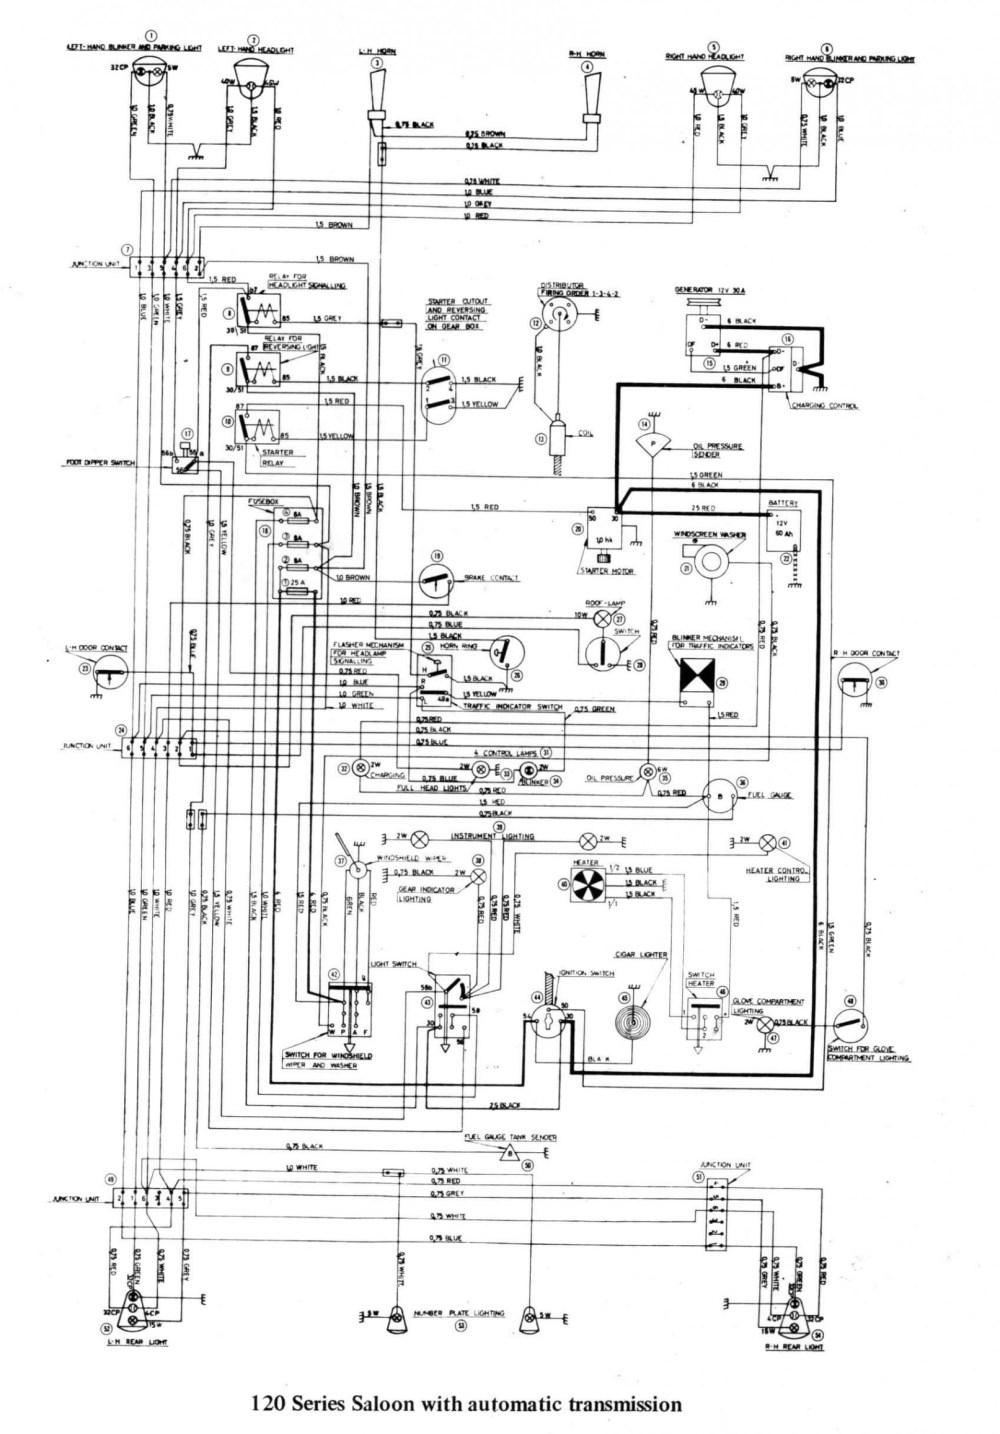 medium resolution of golf cart solenoid wiring diagram club car wiring diagram ezgo wiring diagram unique starter